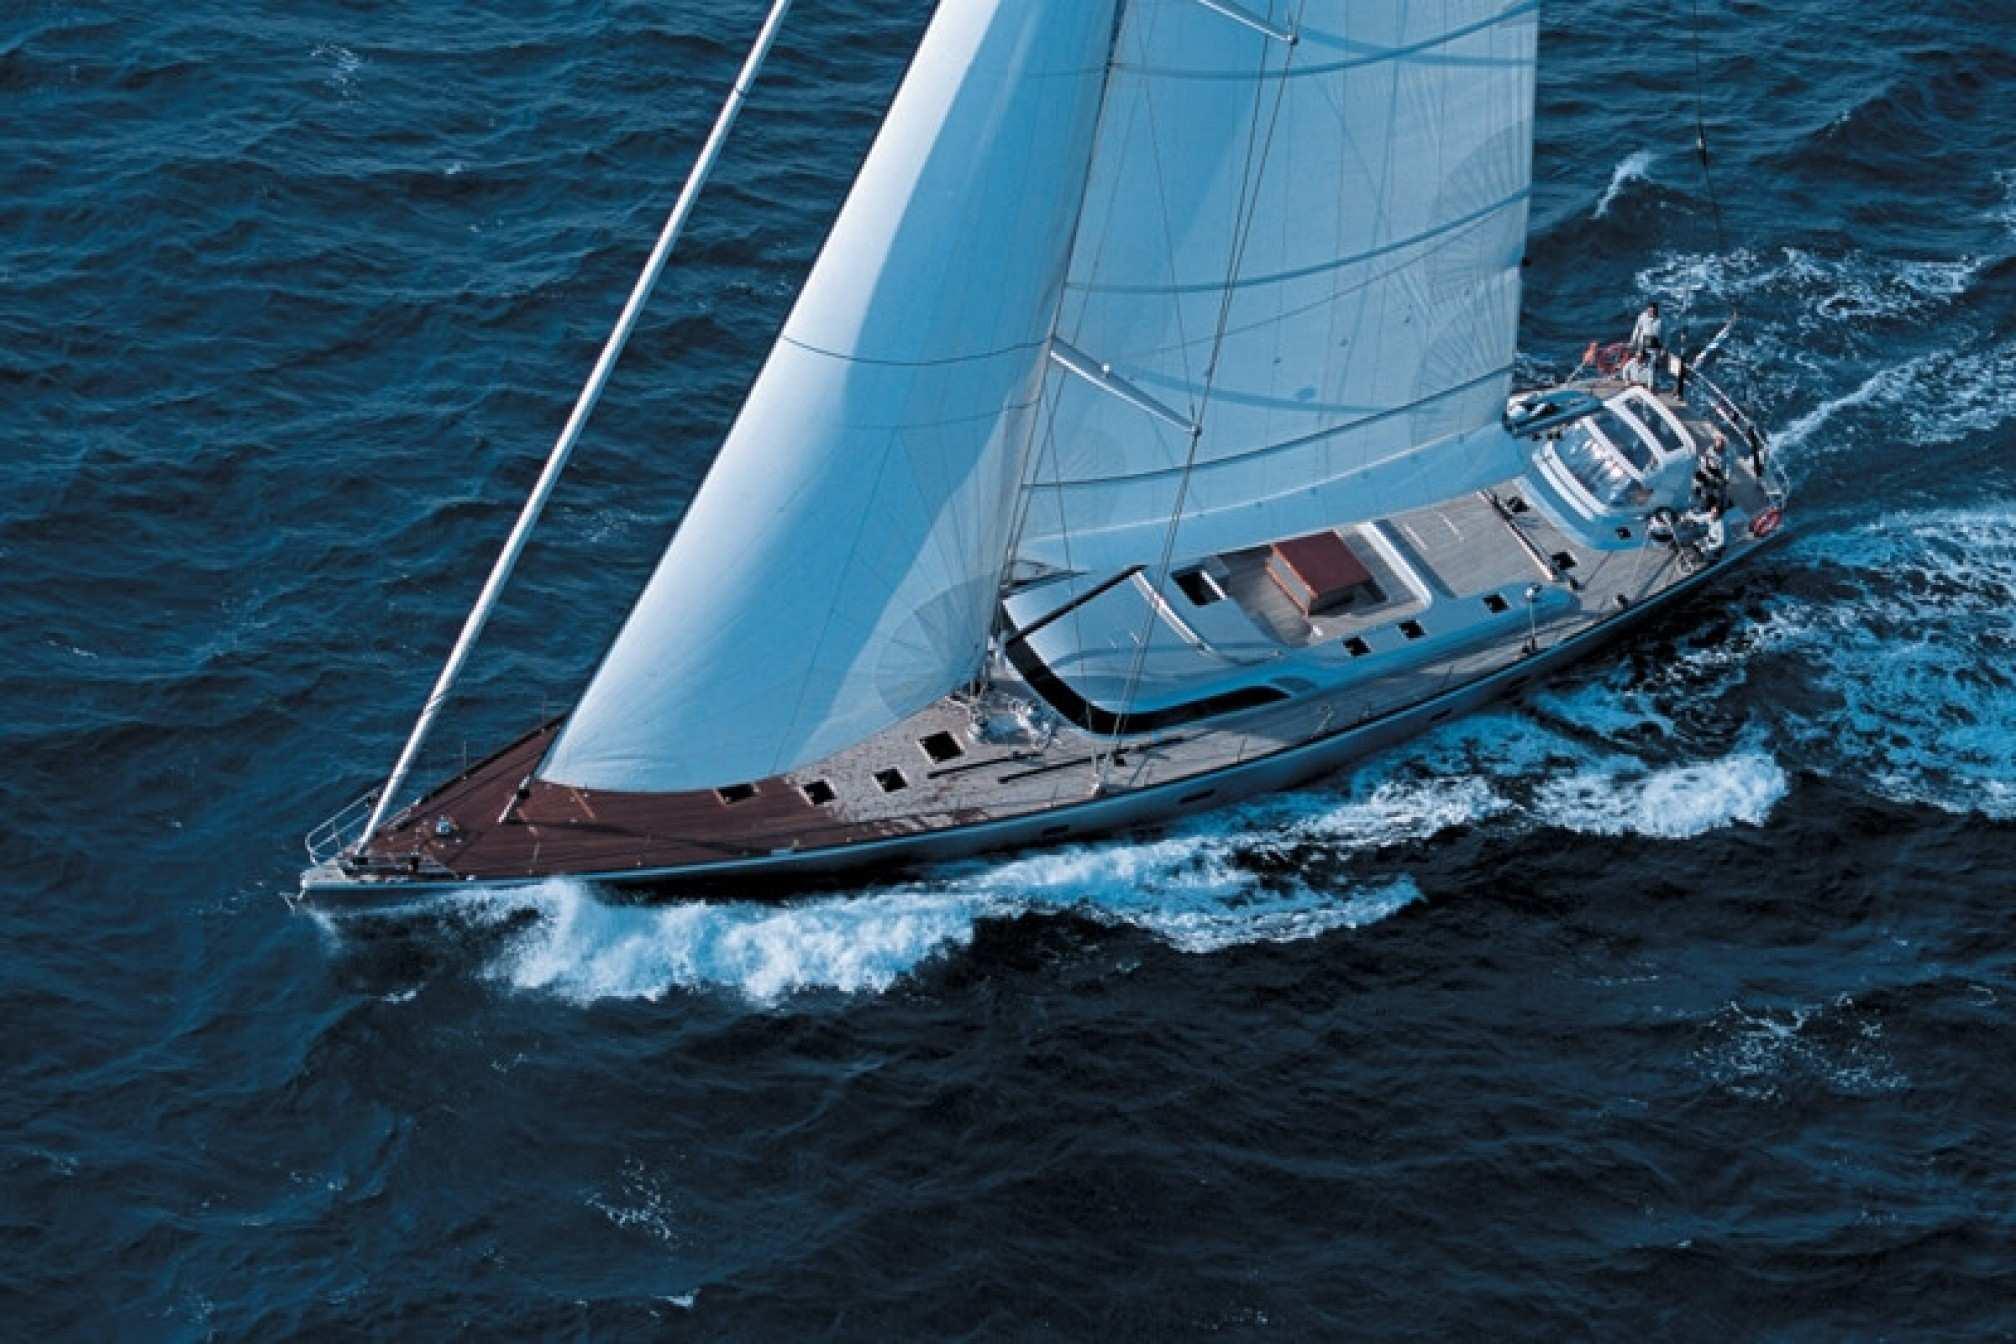 CMN 105 'Attimo' luxury sailboat charter sailing